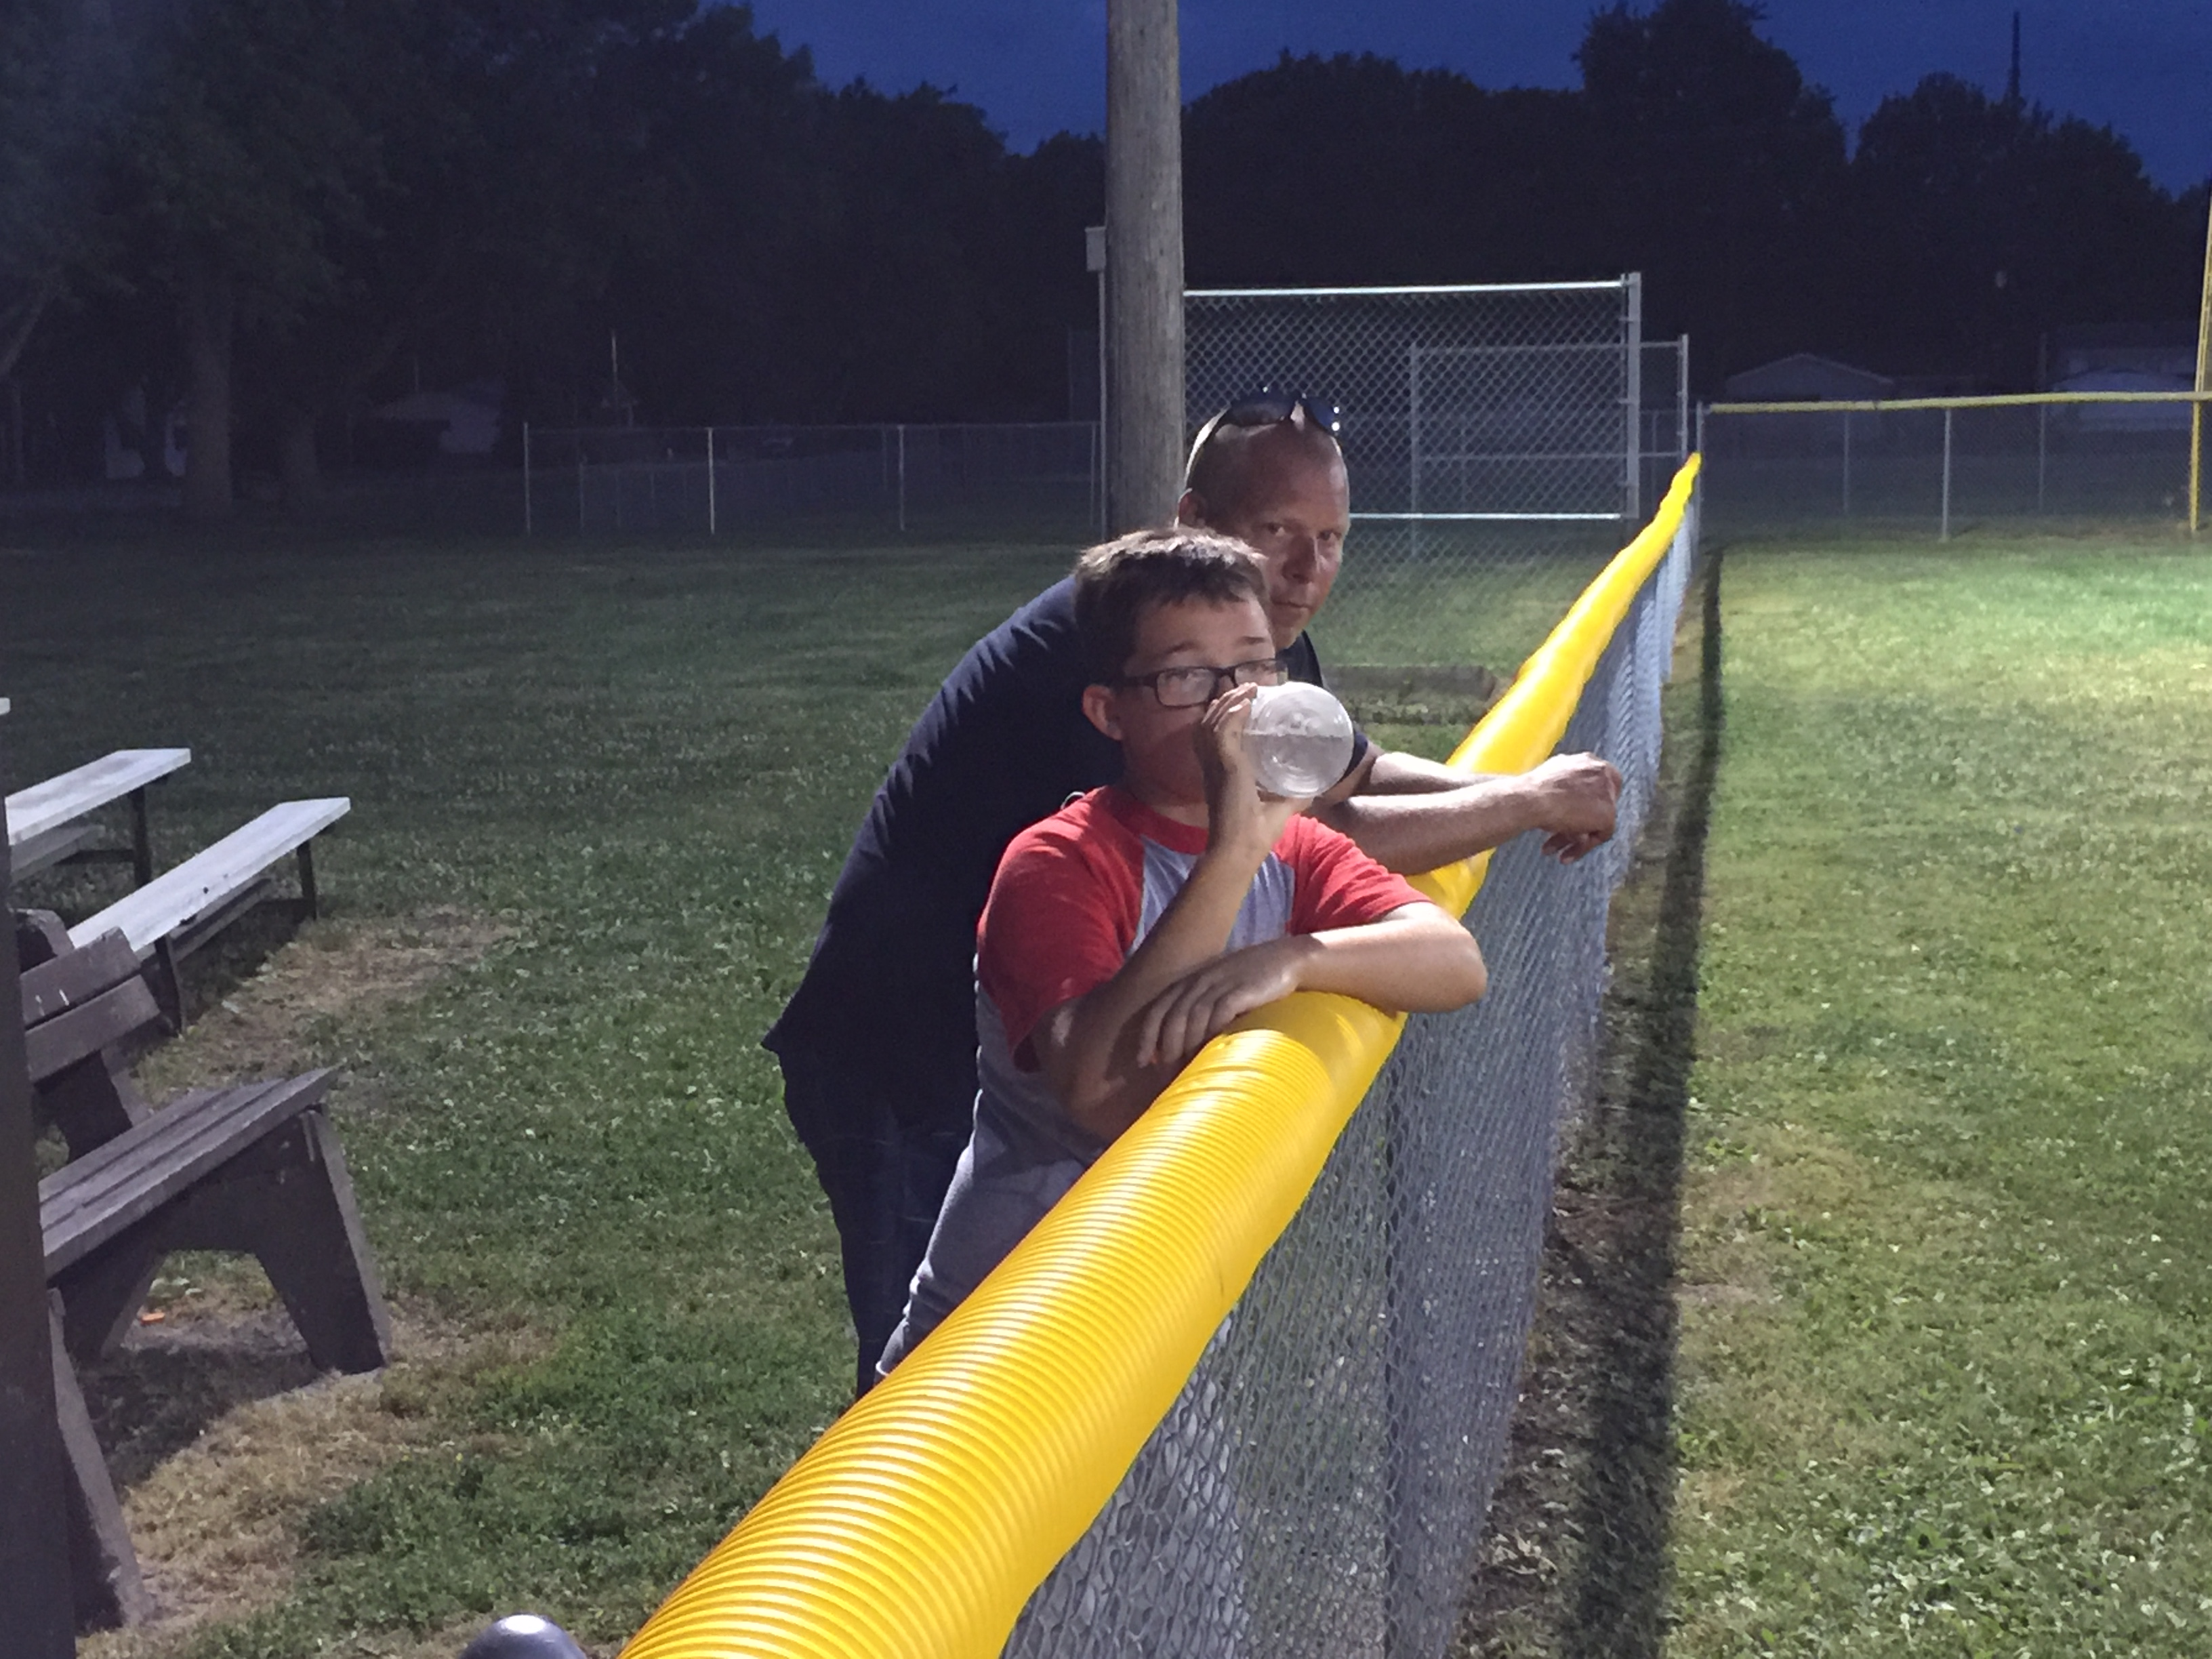 2016 Got Dents Game 14 Images. Springfield, IL 6-21-2016 Got Dents Vs Riverton Cubs